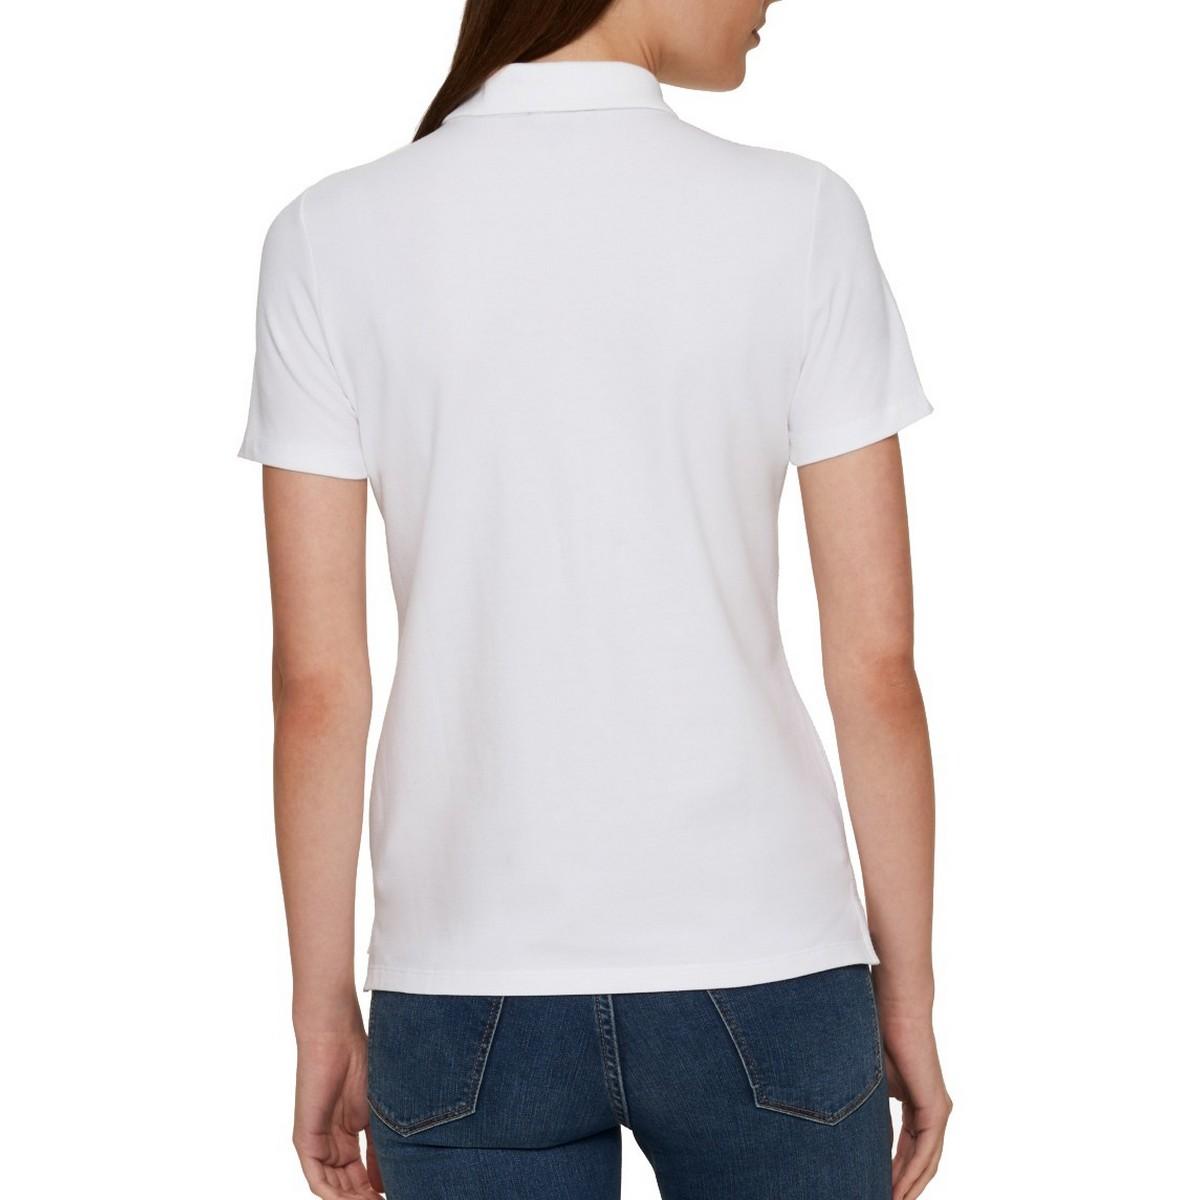 TOMMY-HILFIGER-NEW-Women-039-s-Short-Sleeve-1-2-Zip-Polo-Shirt-Top-TEDO thumbnail 4